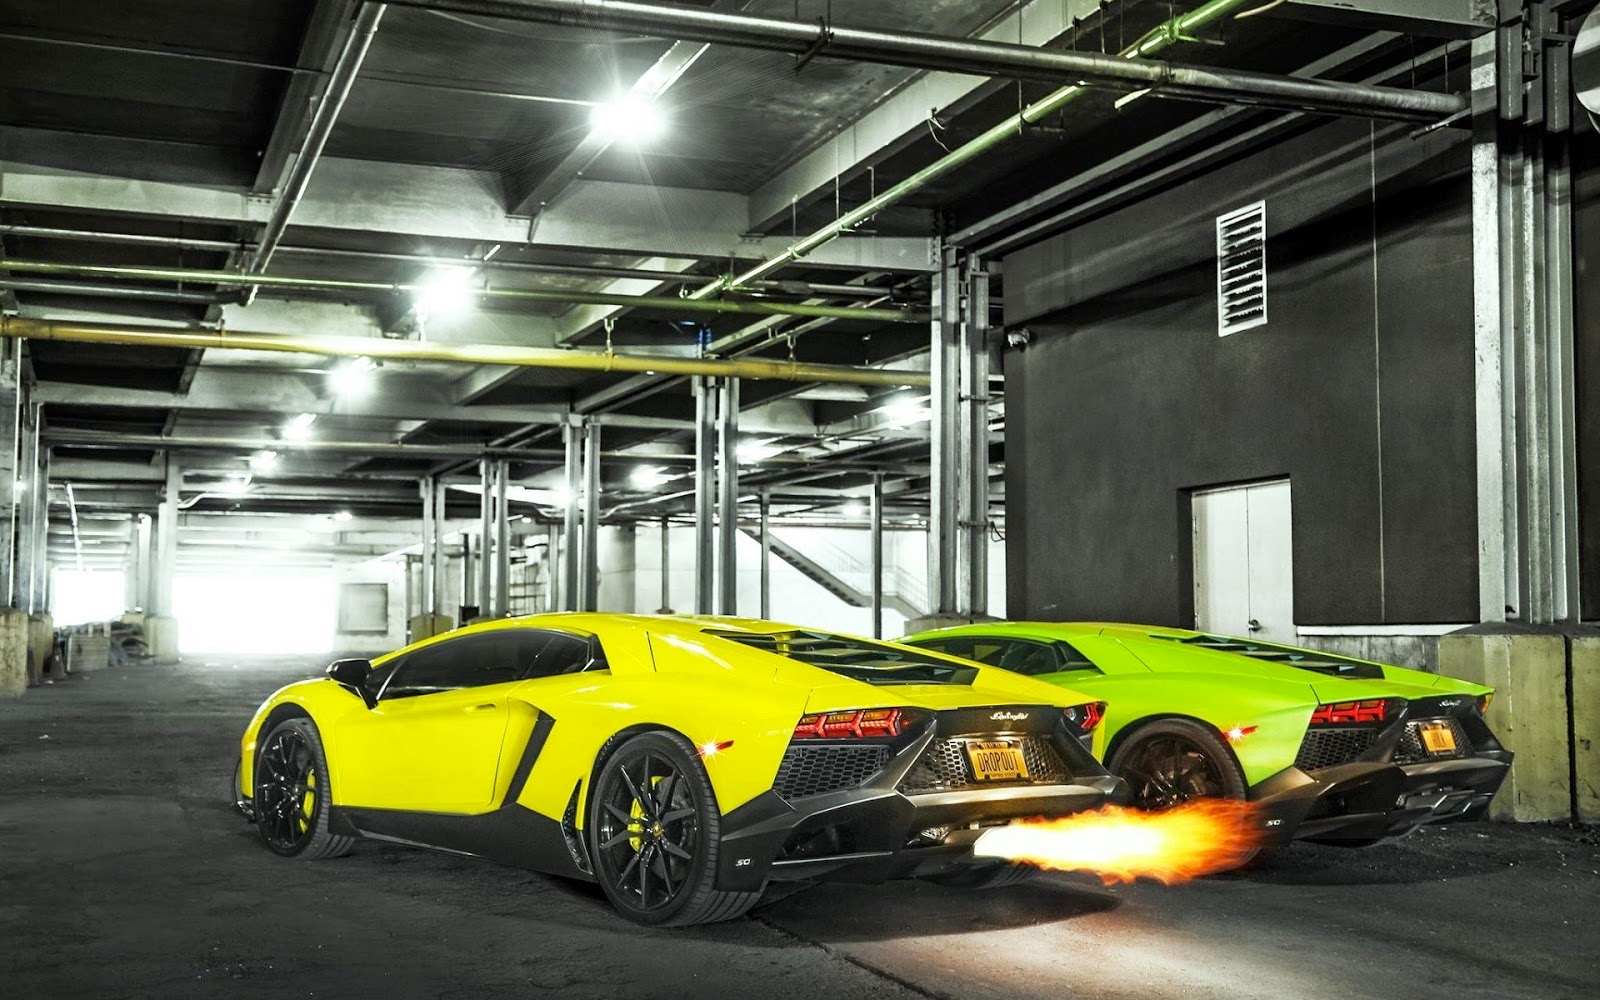 lamborghini-aventador-lp-720-4-yellow-green-cars-fire-wallpaper-1920x1200-www.epichdwallpapers.com